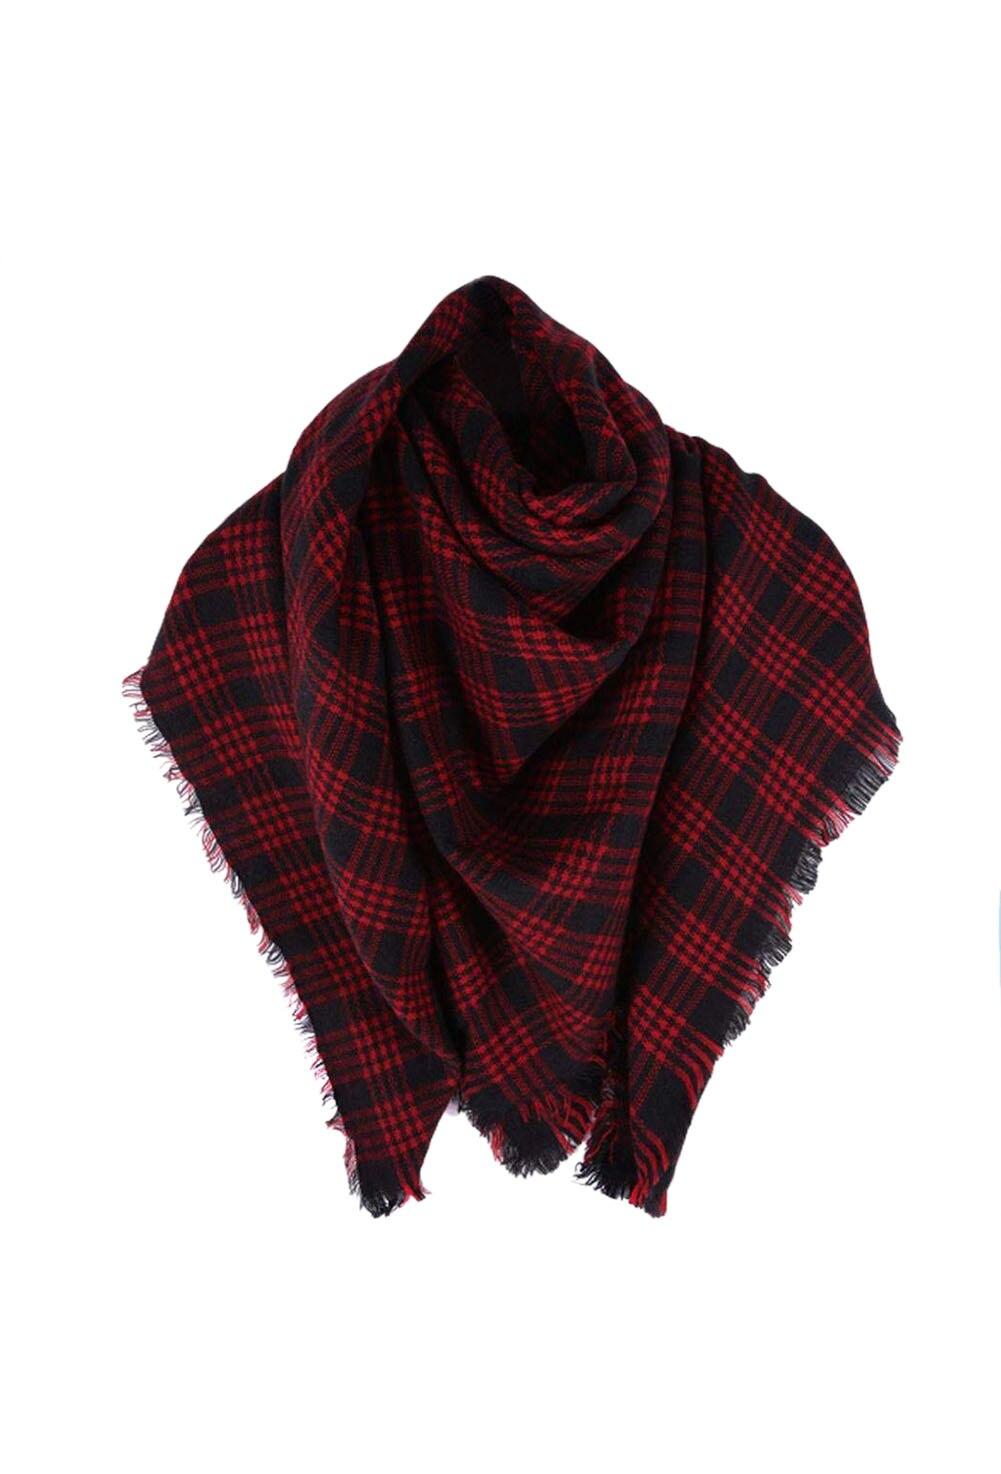 Wool Blend font b Tartan b font Plaid Soft Scarf Shawl Blanket Stole Pashmina Red Black